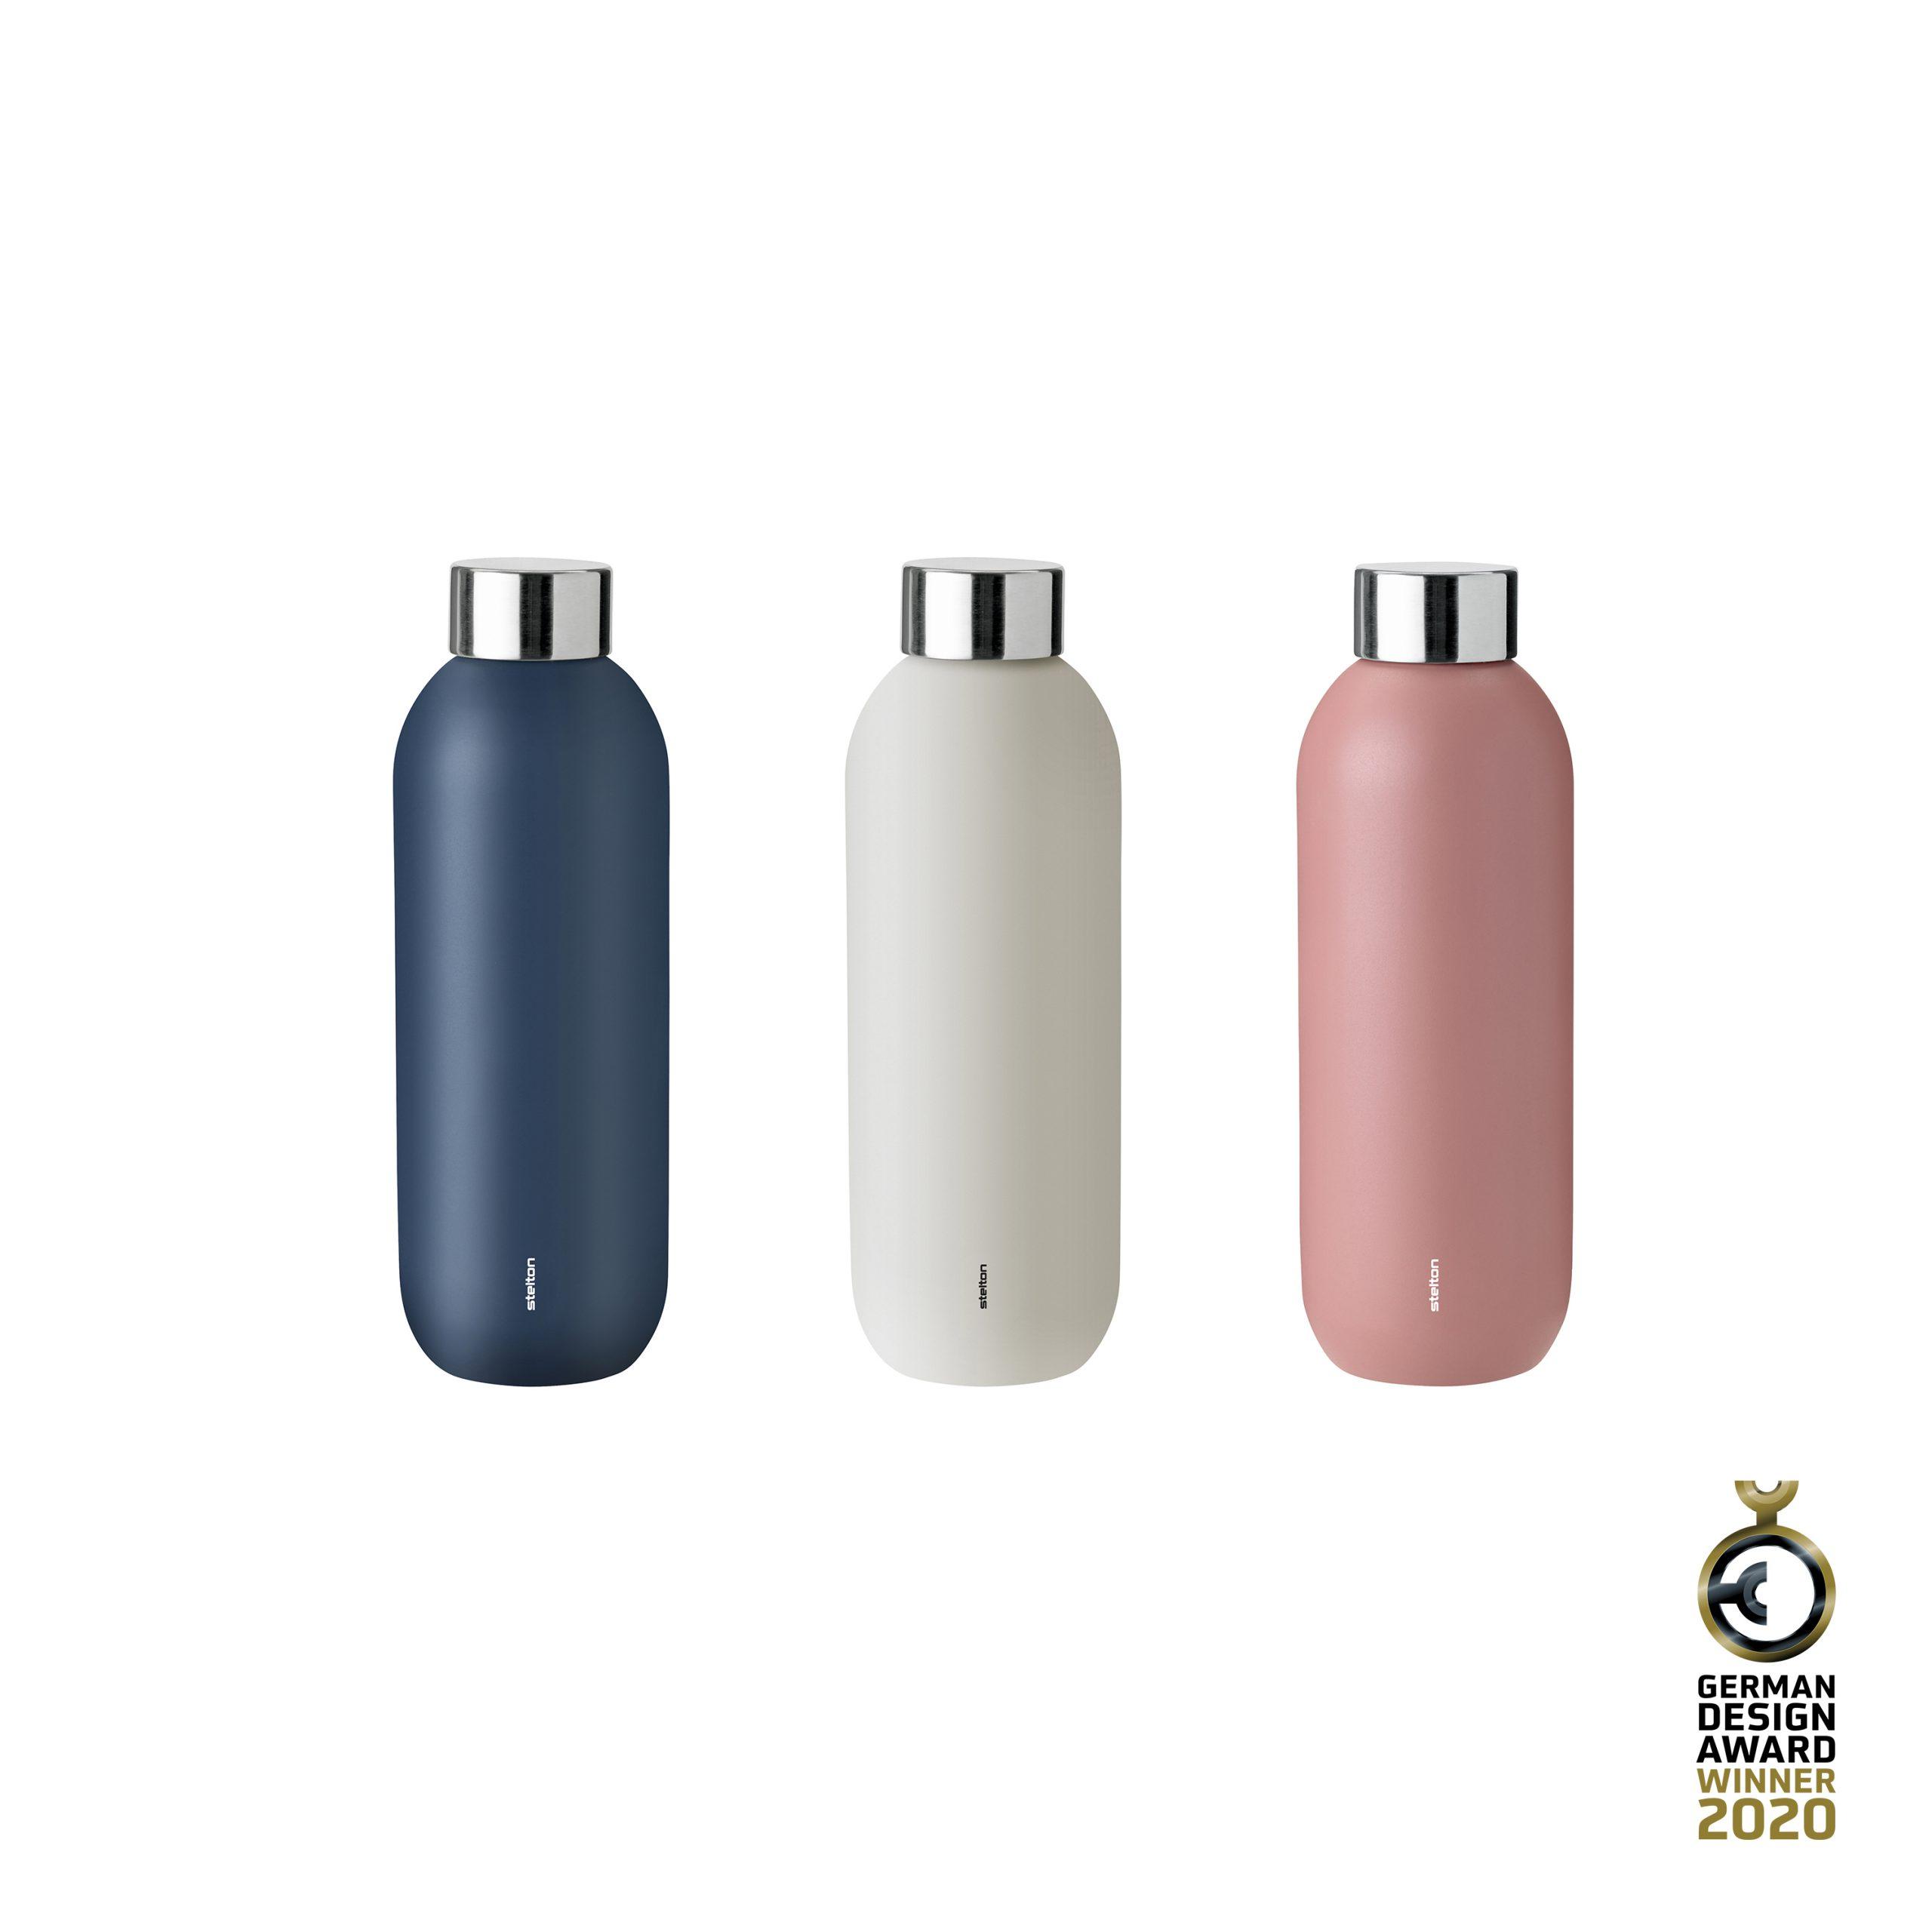 German Design Award for Keep Cool bottle by Debiasi Sandri for Stelton